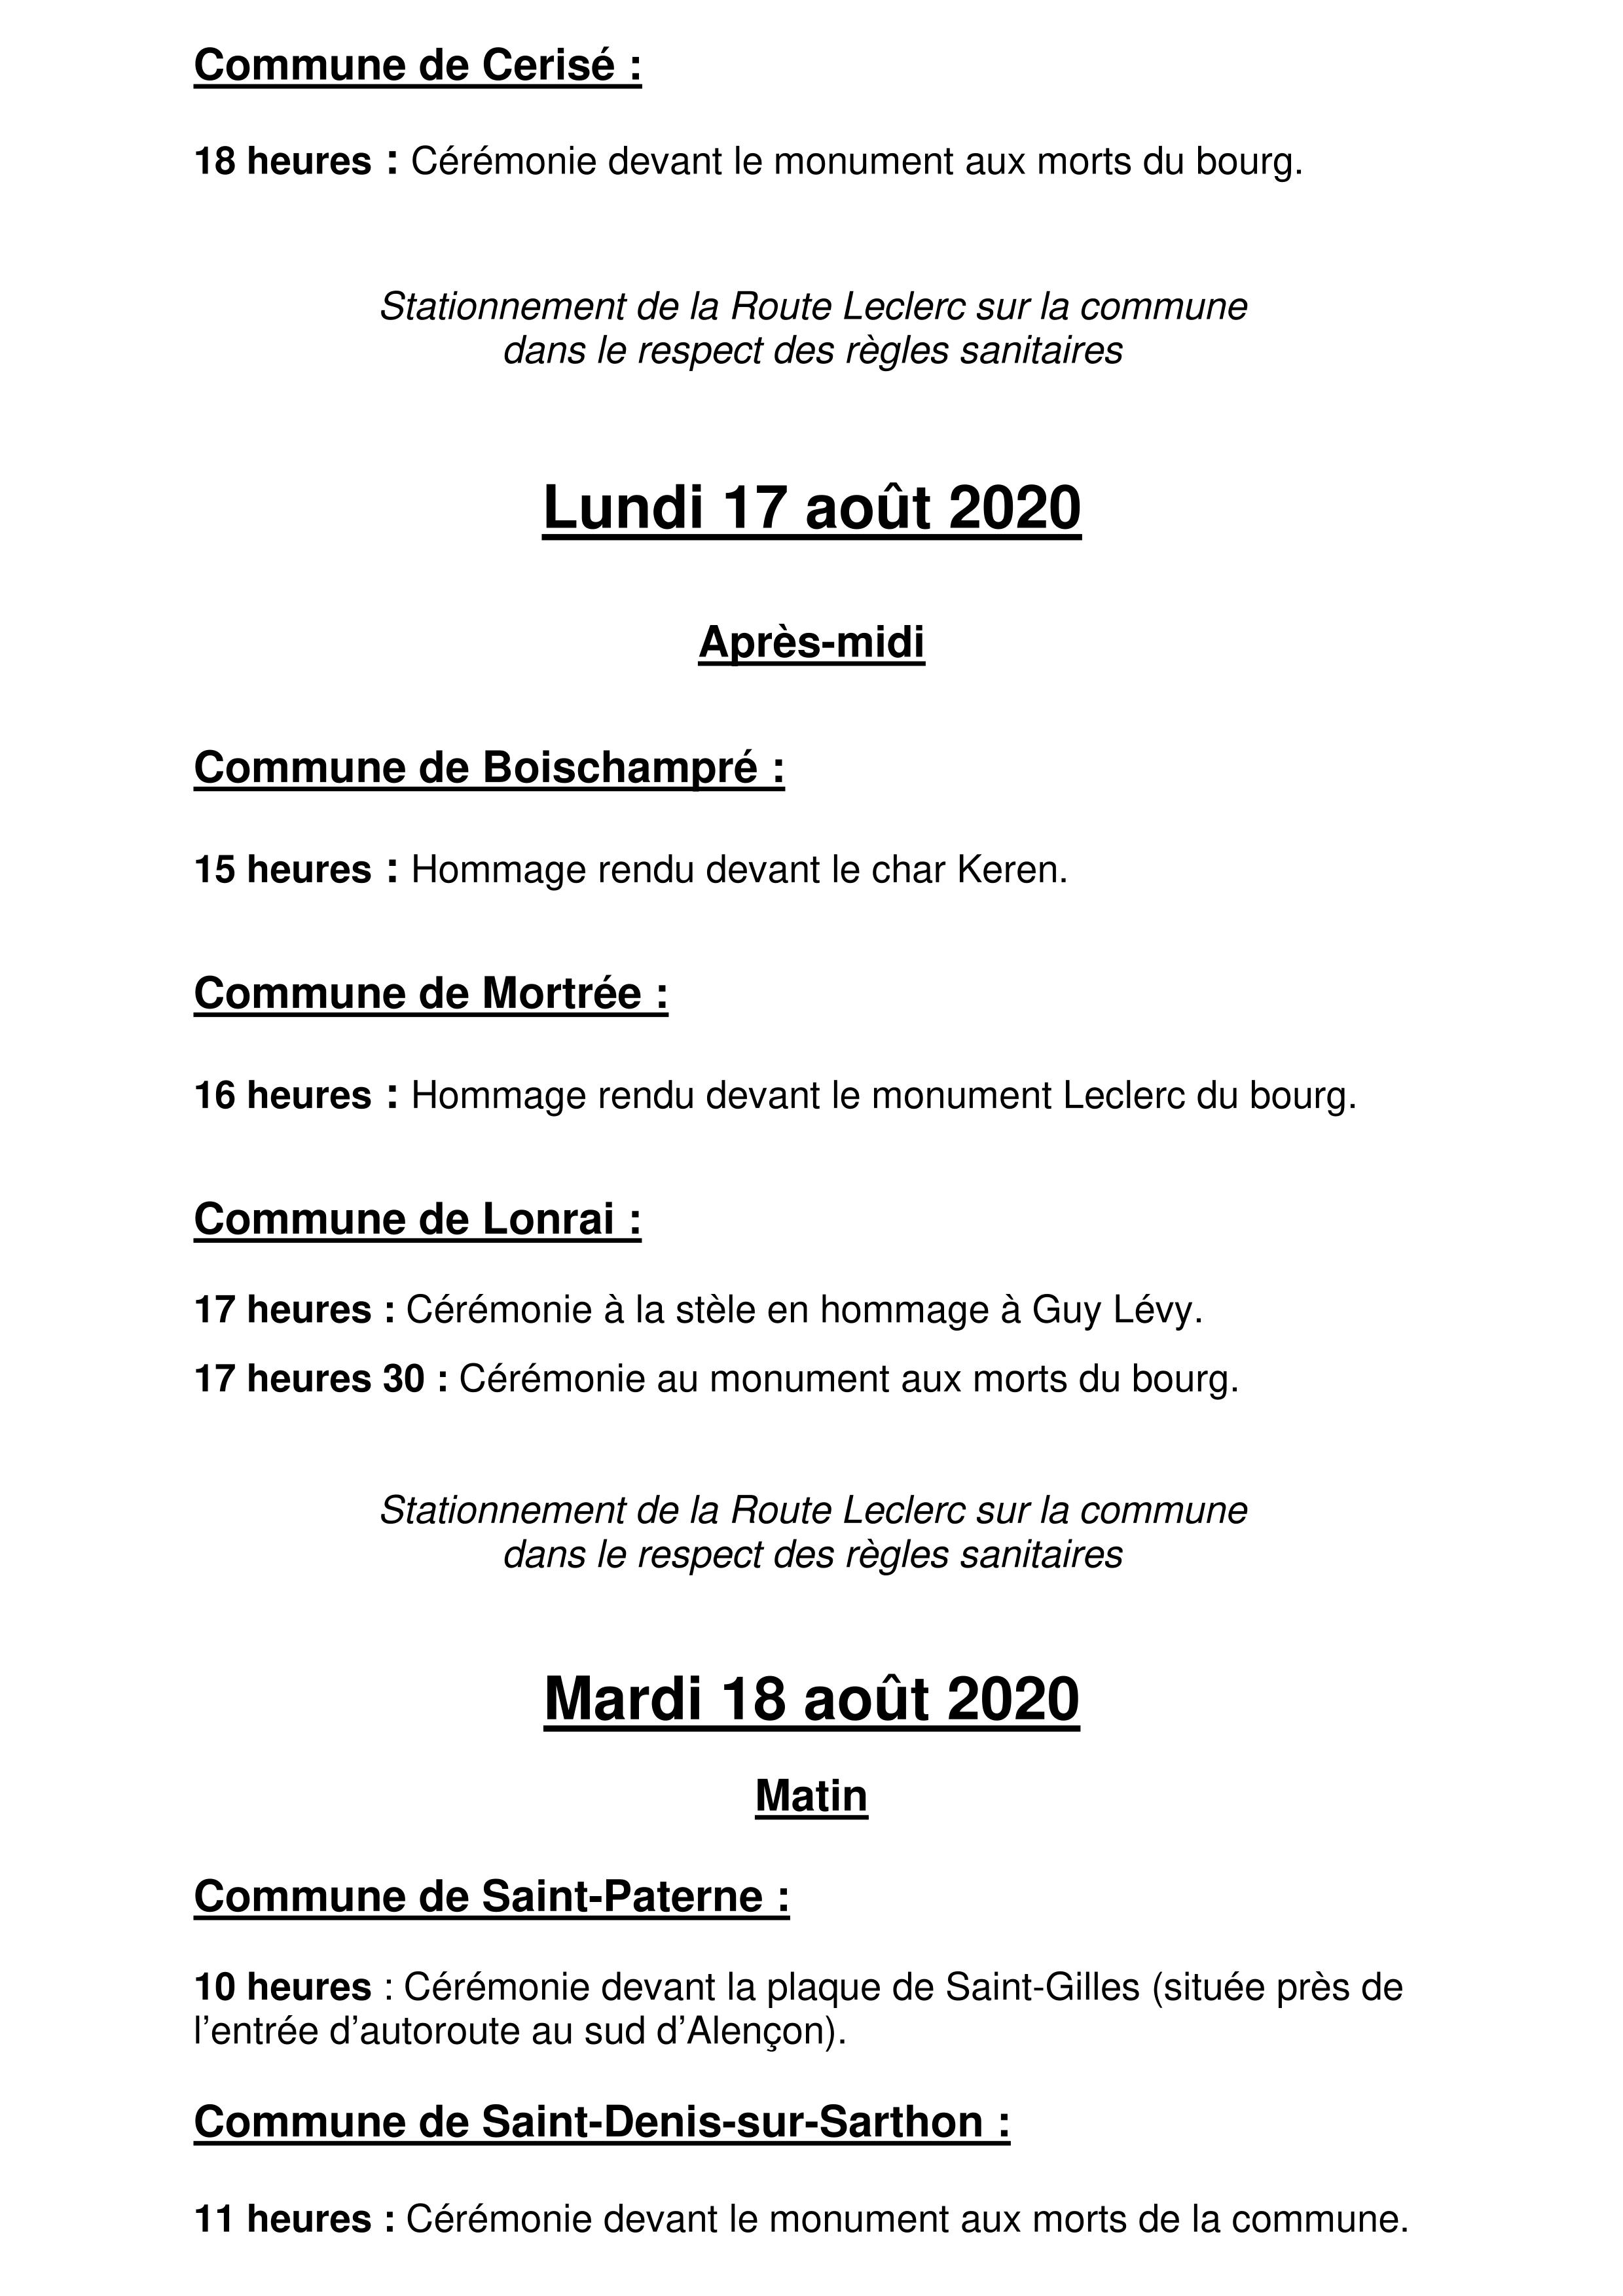 RL 2020 - 7